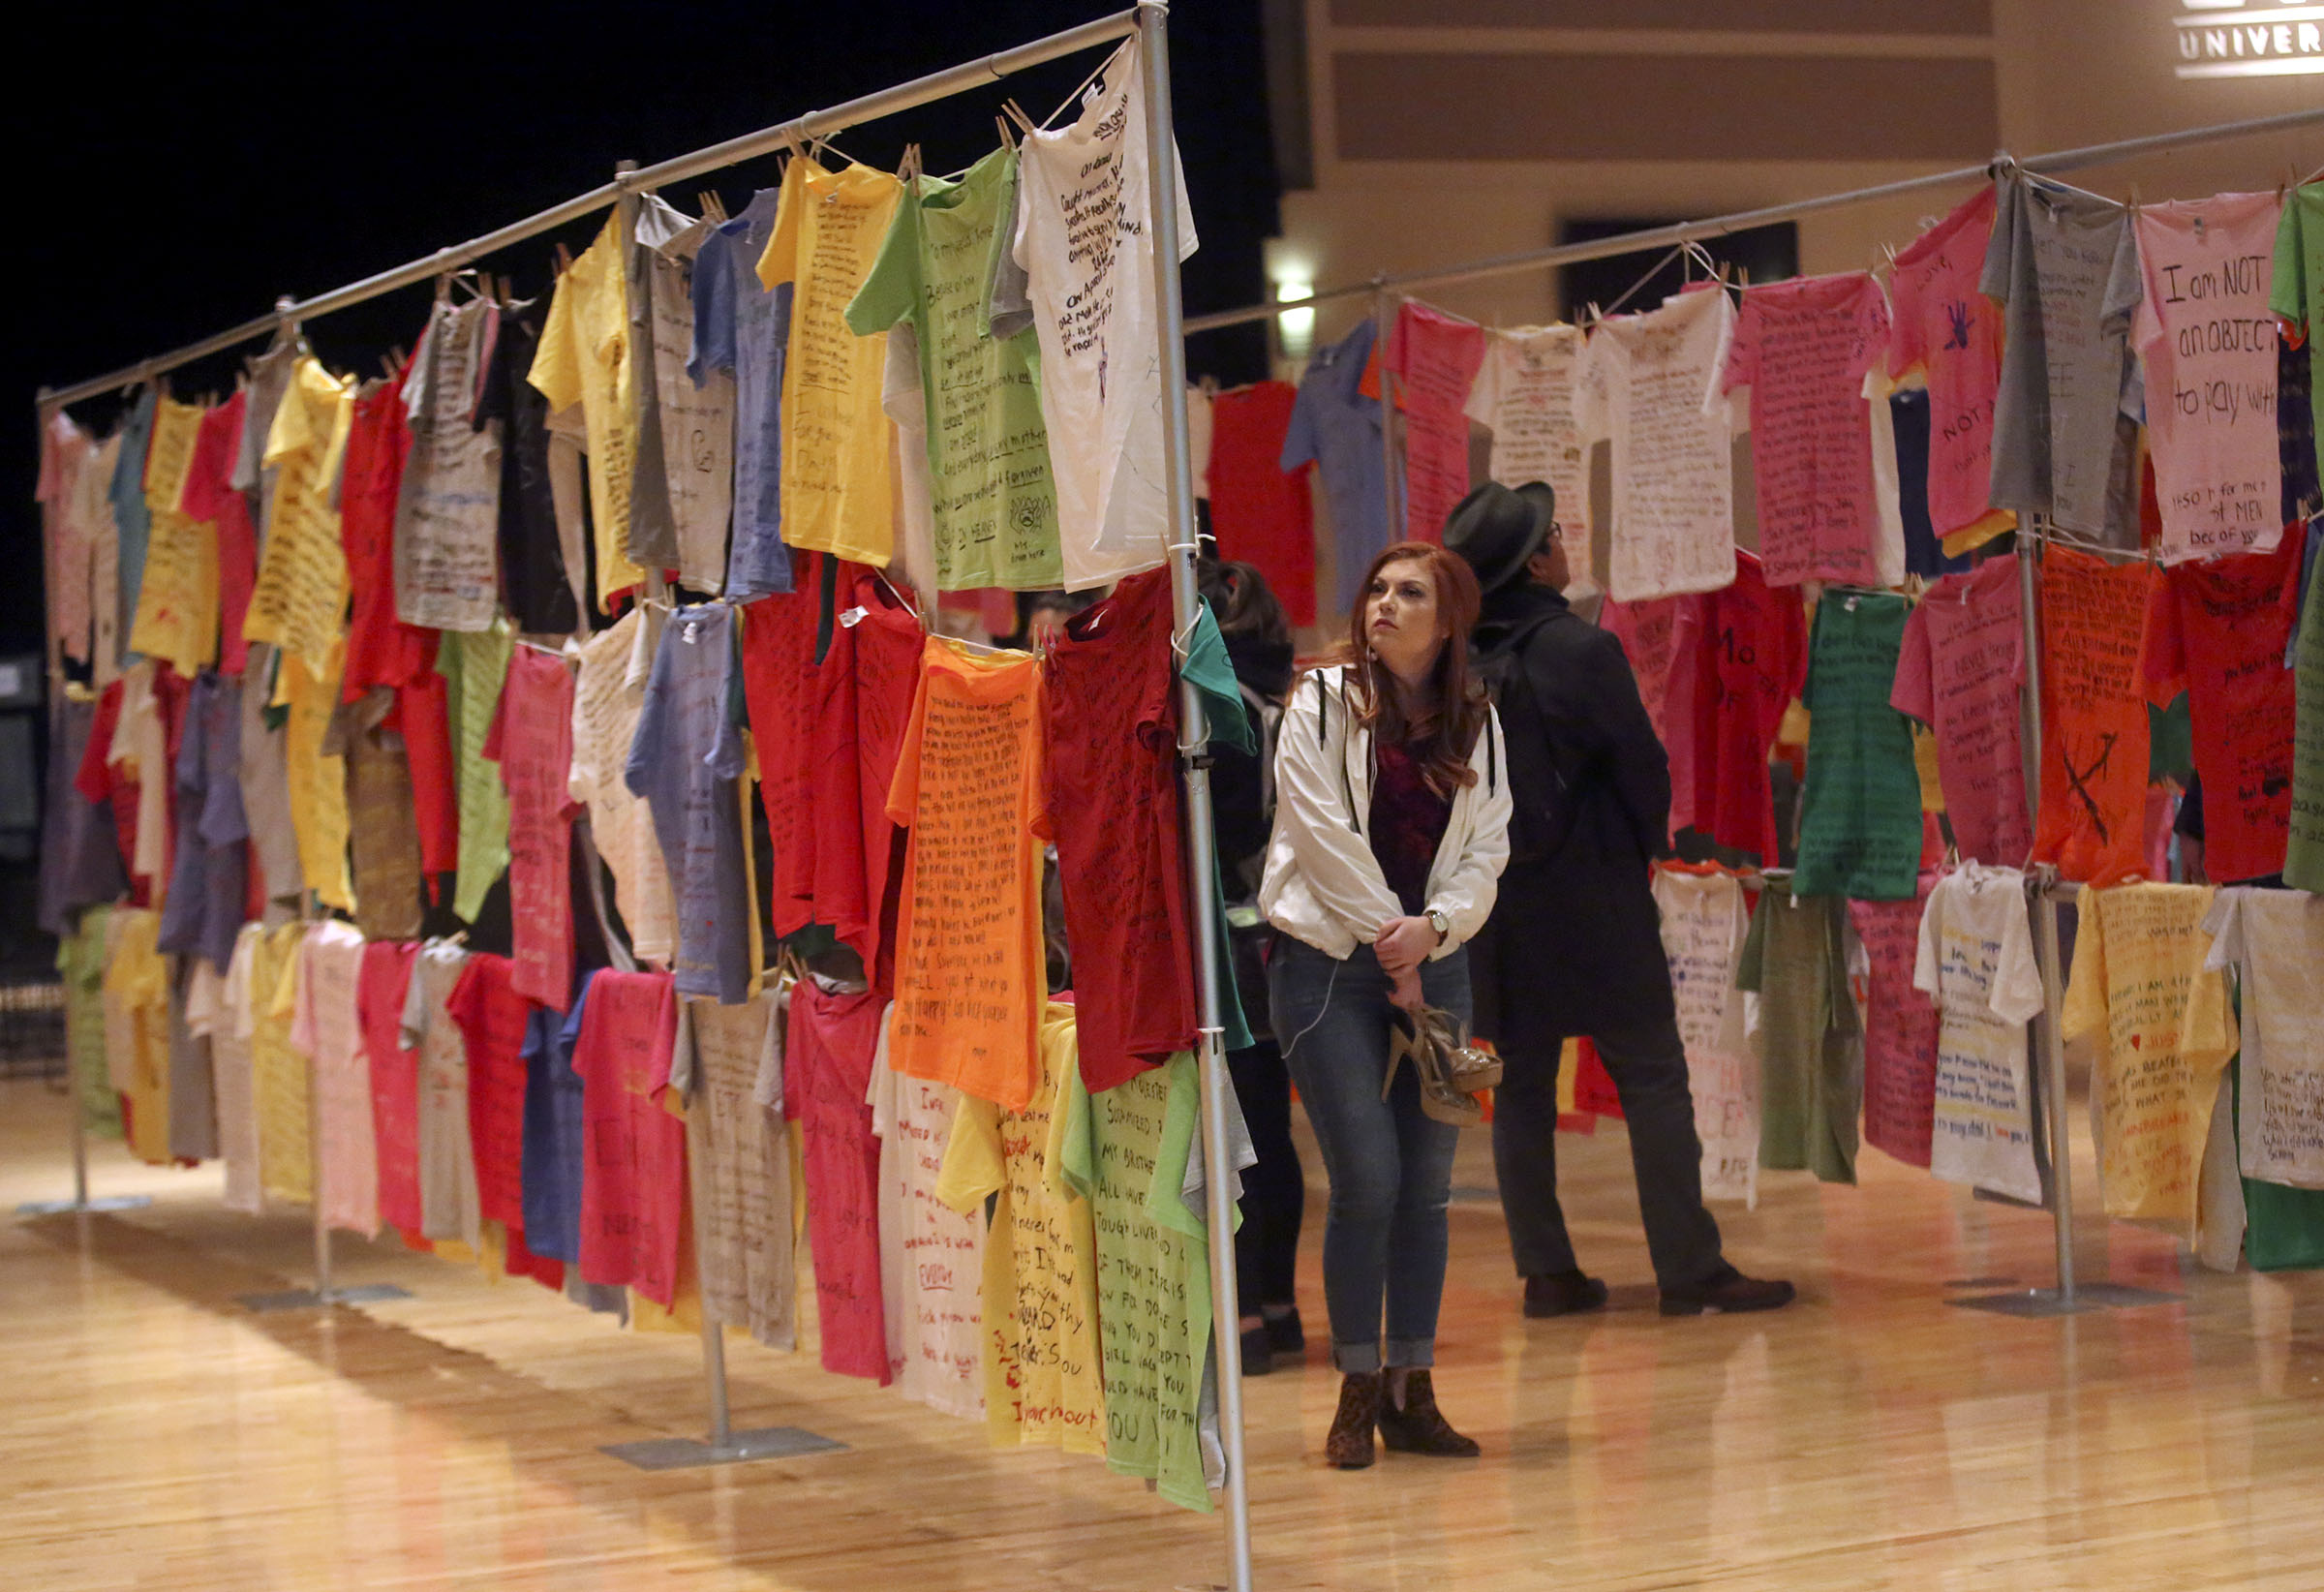 McKenzie Jensen explores the Clothesline Project at Utah Valley University in Orem on Wednesday, Oct. 31, 2018.